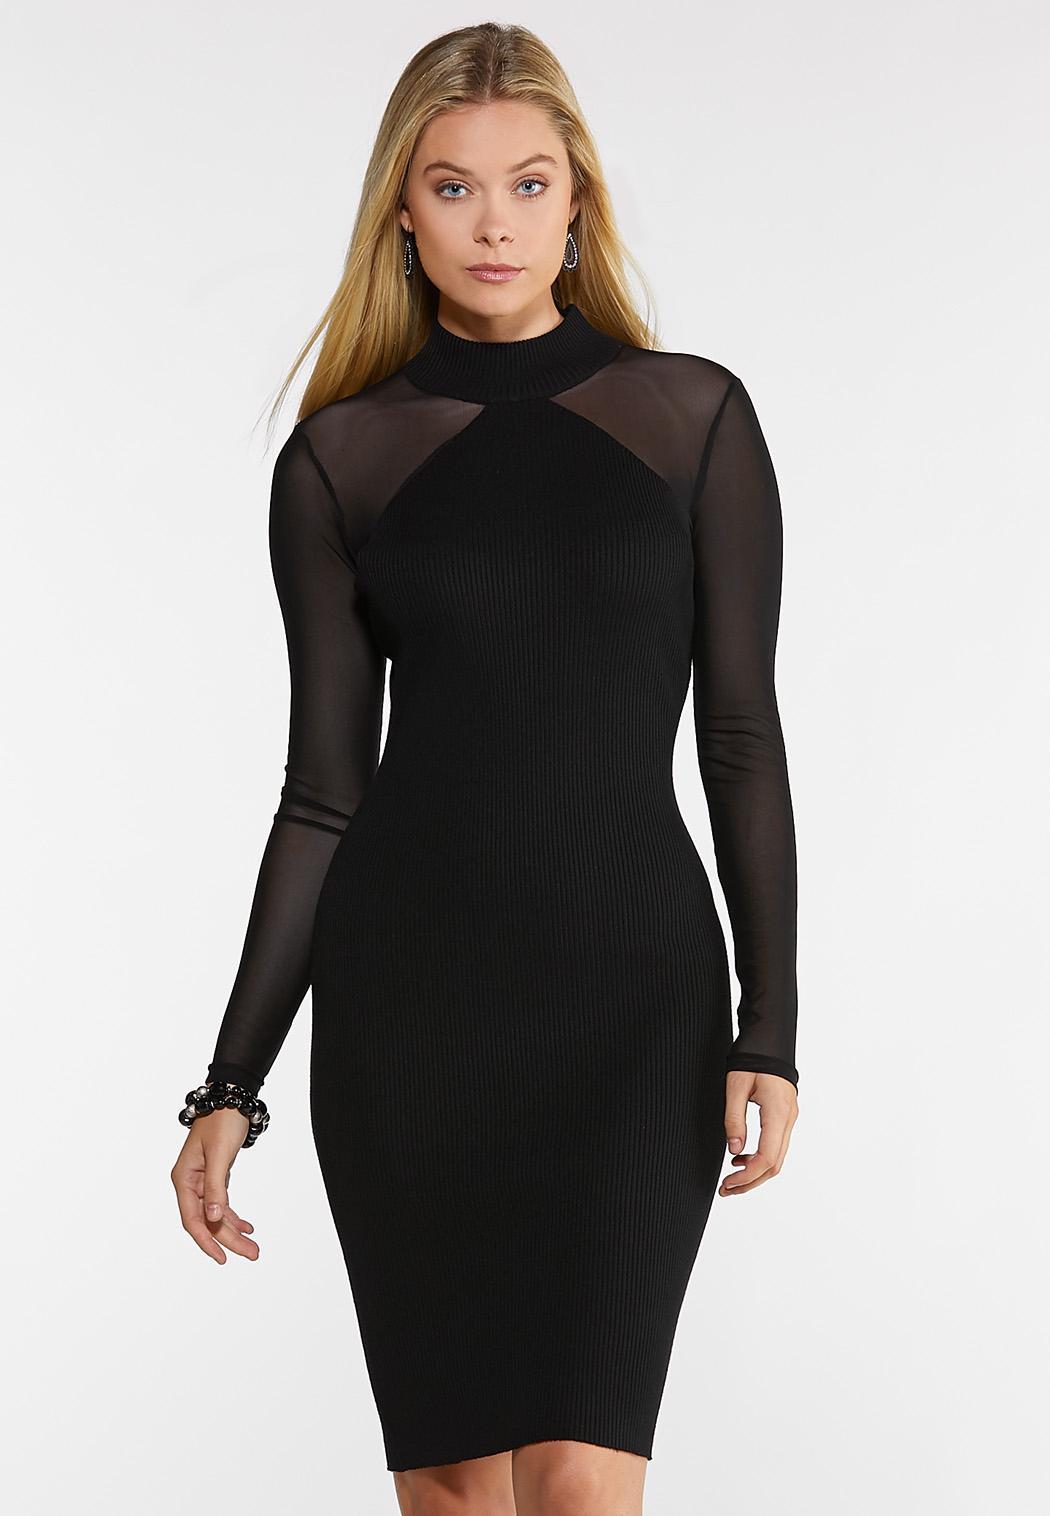 Plus Size Illusion Sleeve Sweater Dress Plus Sizes Cato Fashions